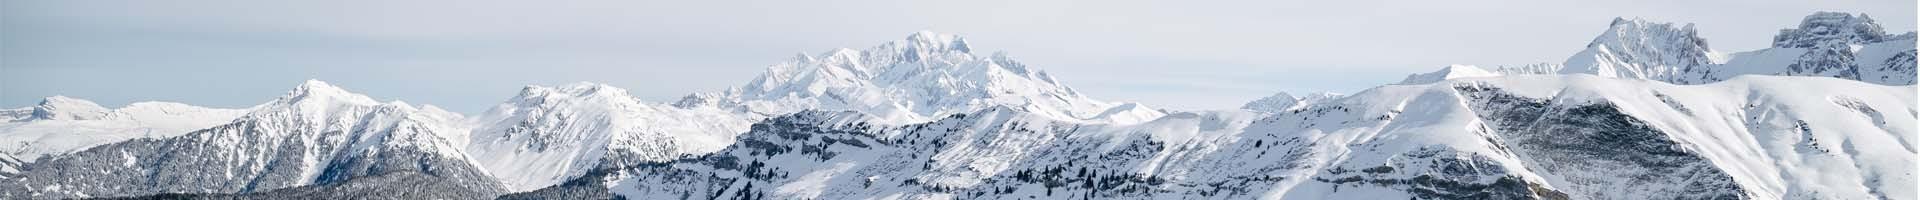 bandeau-hiver-43